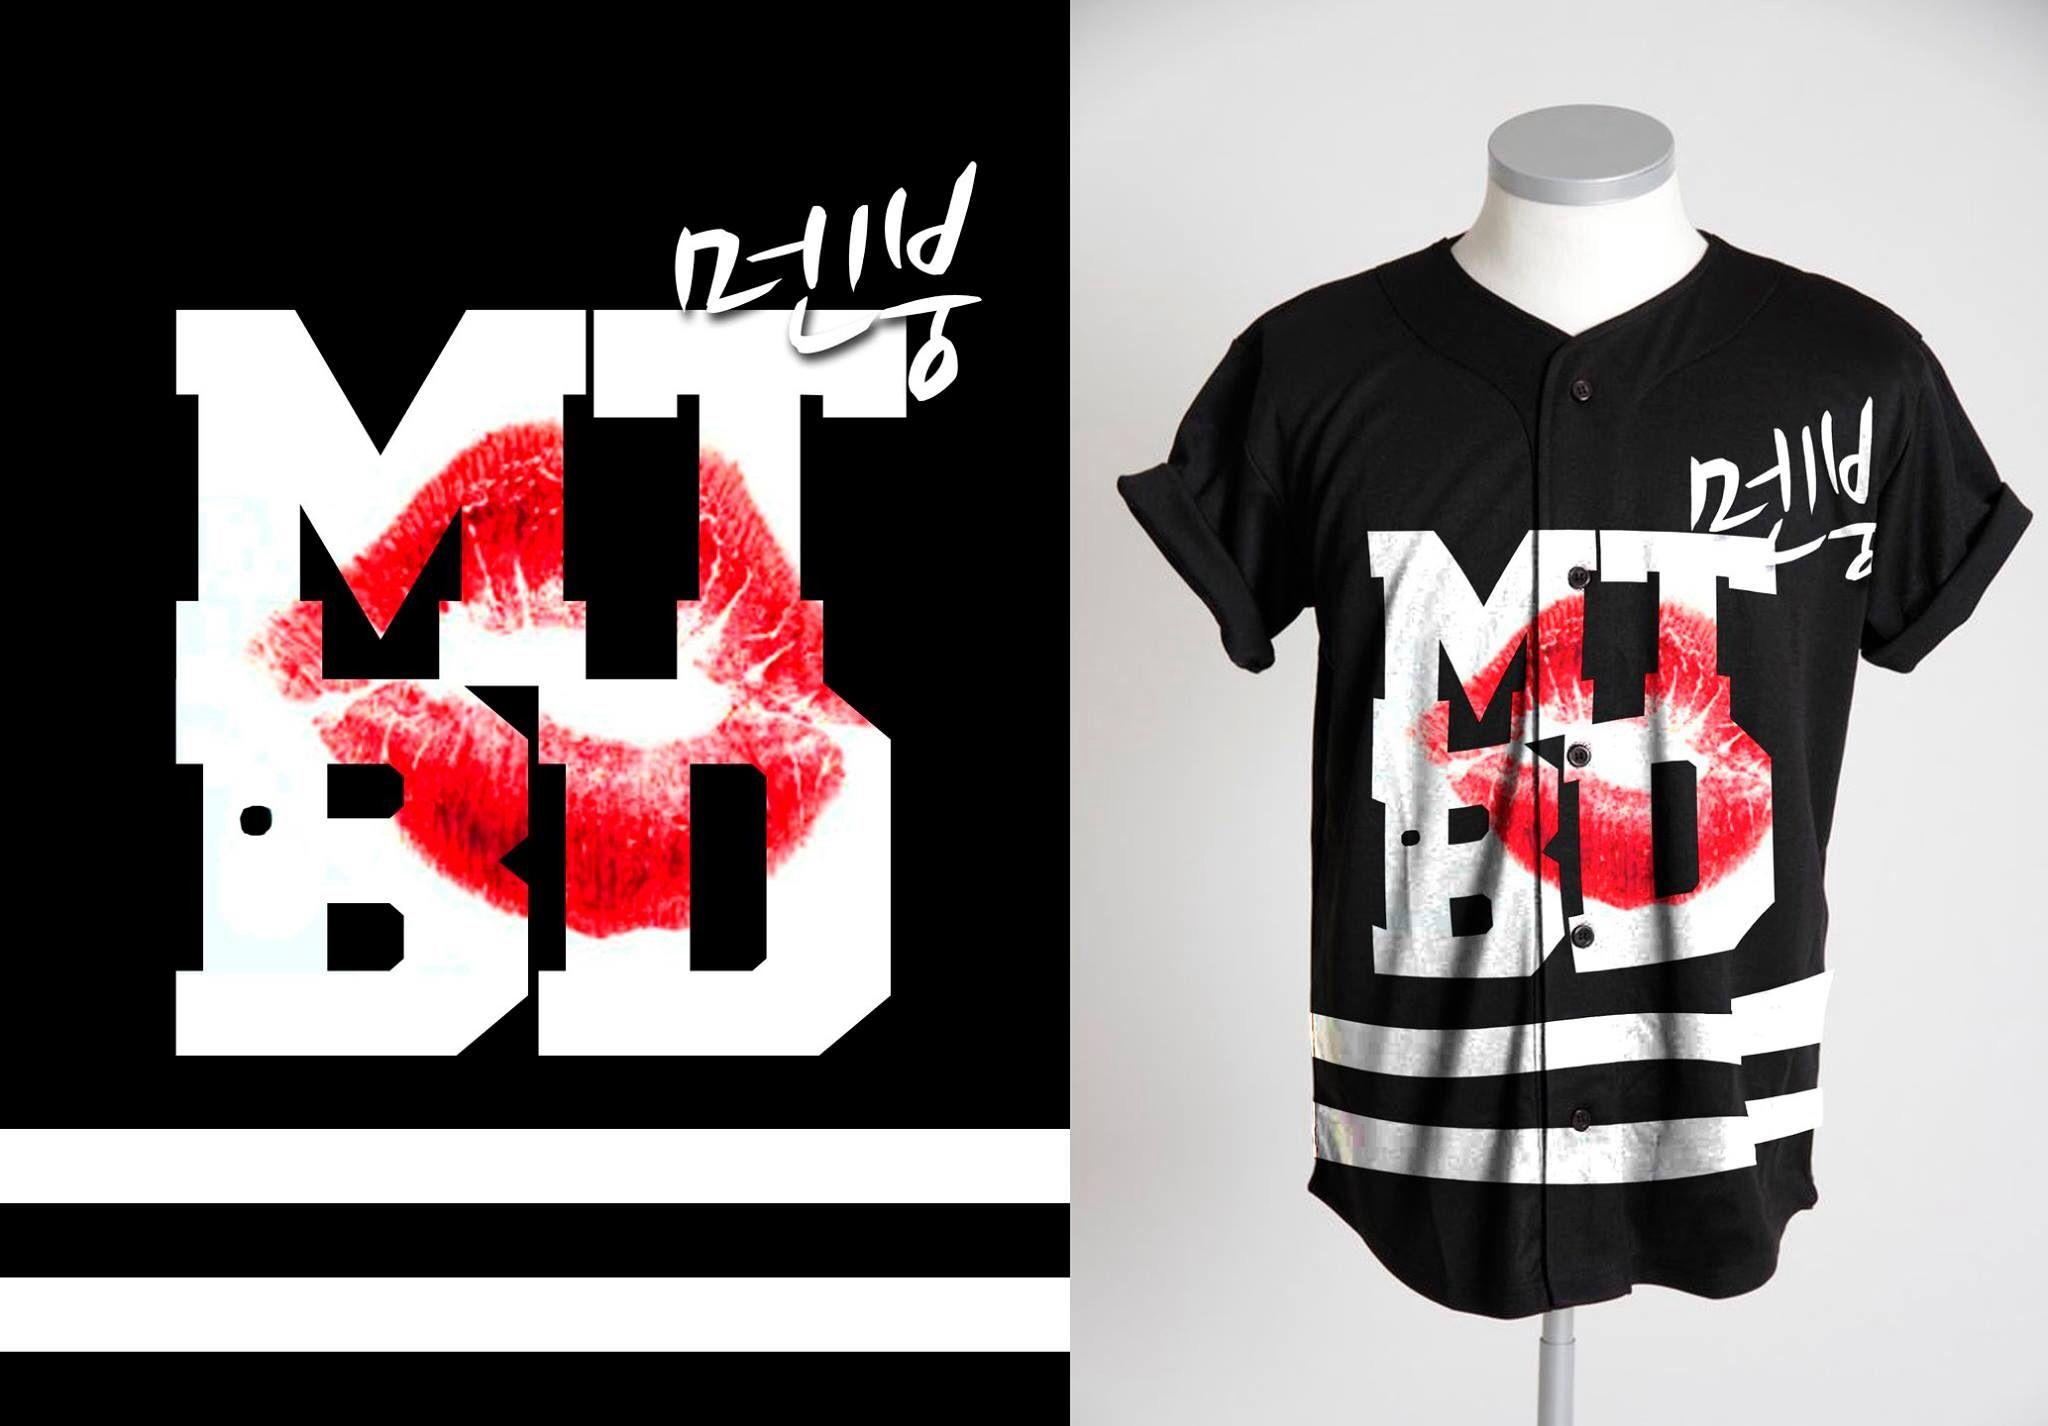 CHAERIN LEE 멘붕 (MTBD) MENTAL BREAKDOWN inspired jersey